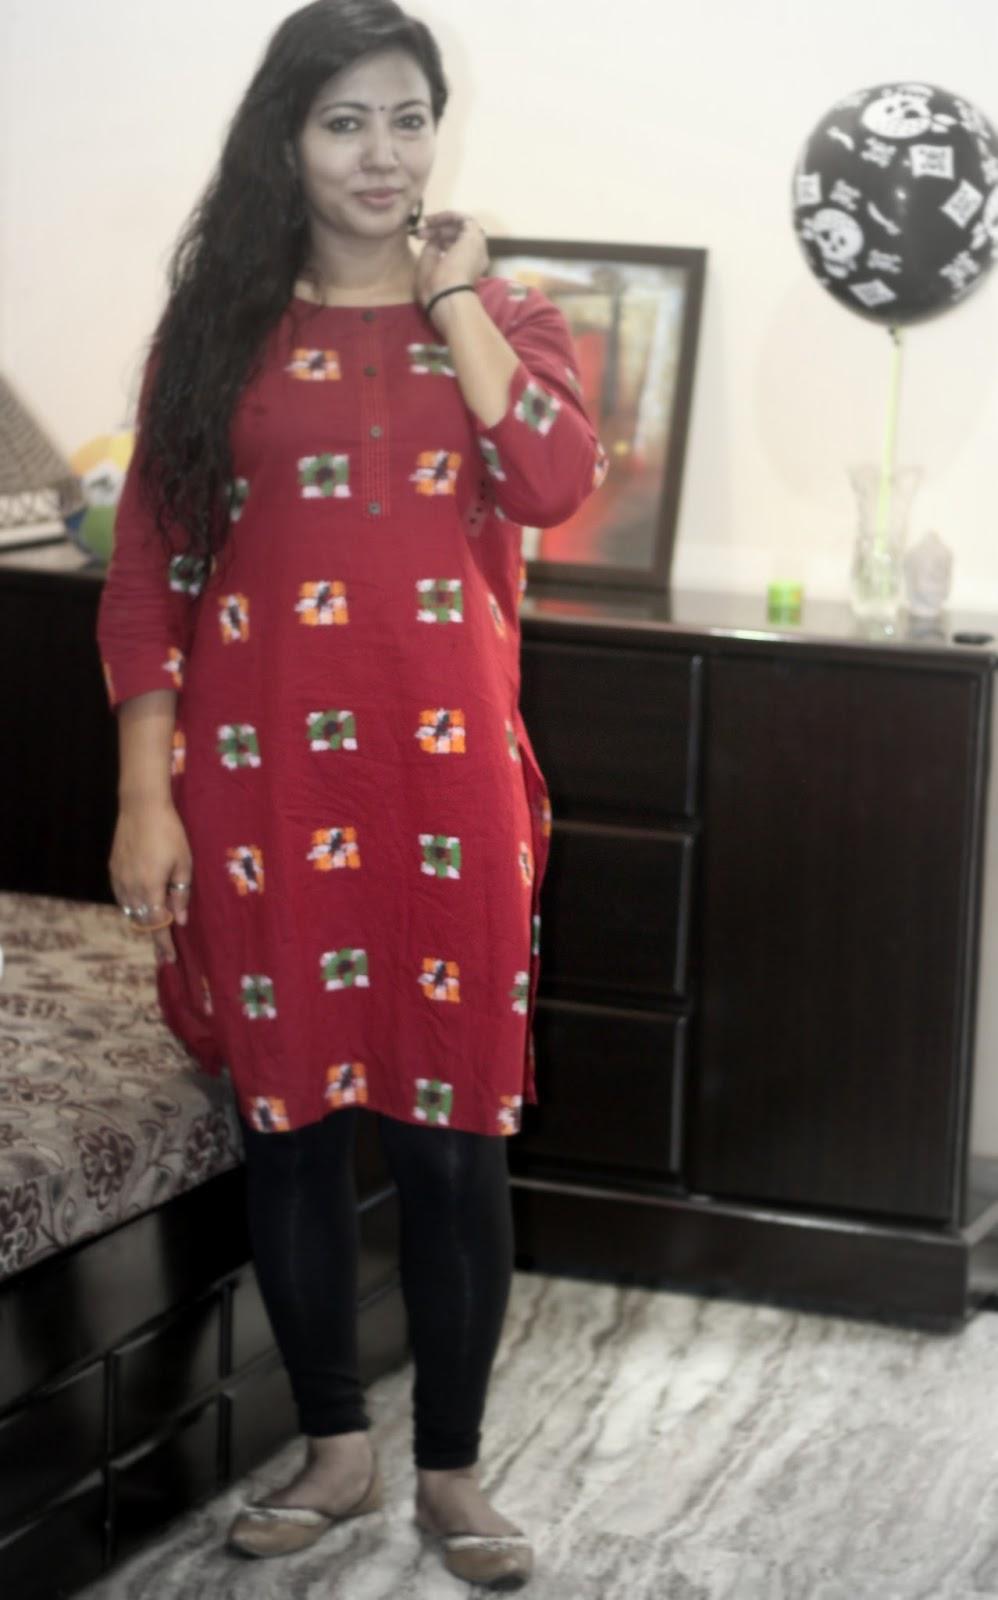 95778541da MAX Fashions IKAT Print Kurti #IndianWears #IkatKurti - Shopping ...